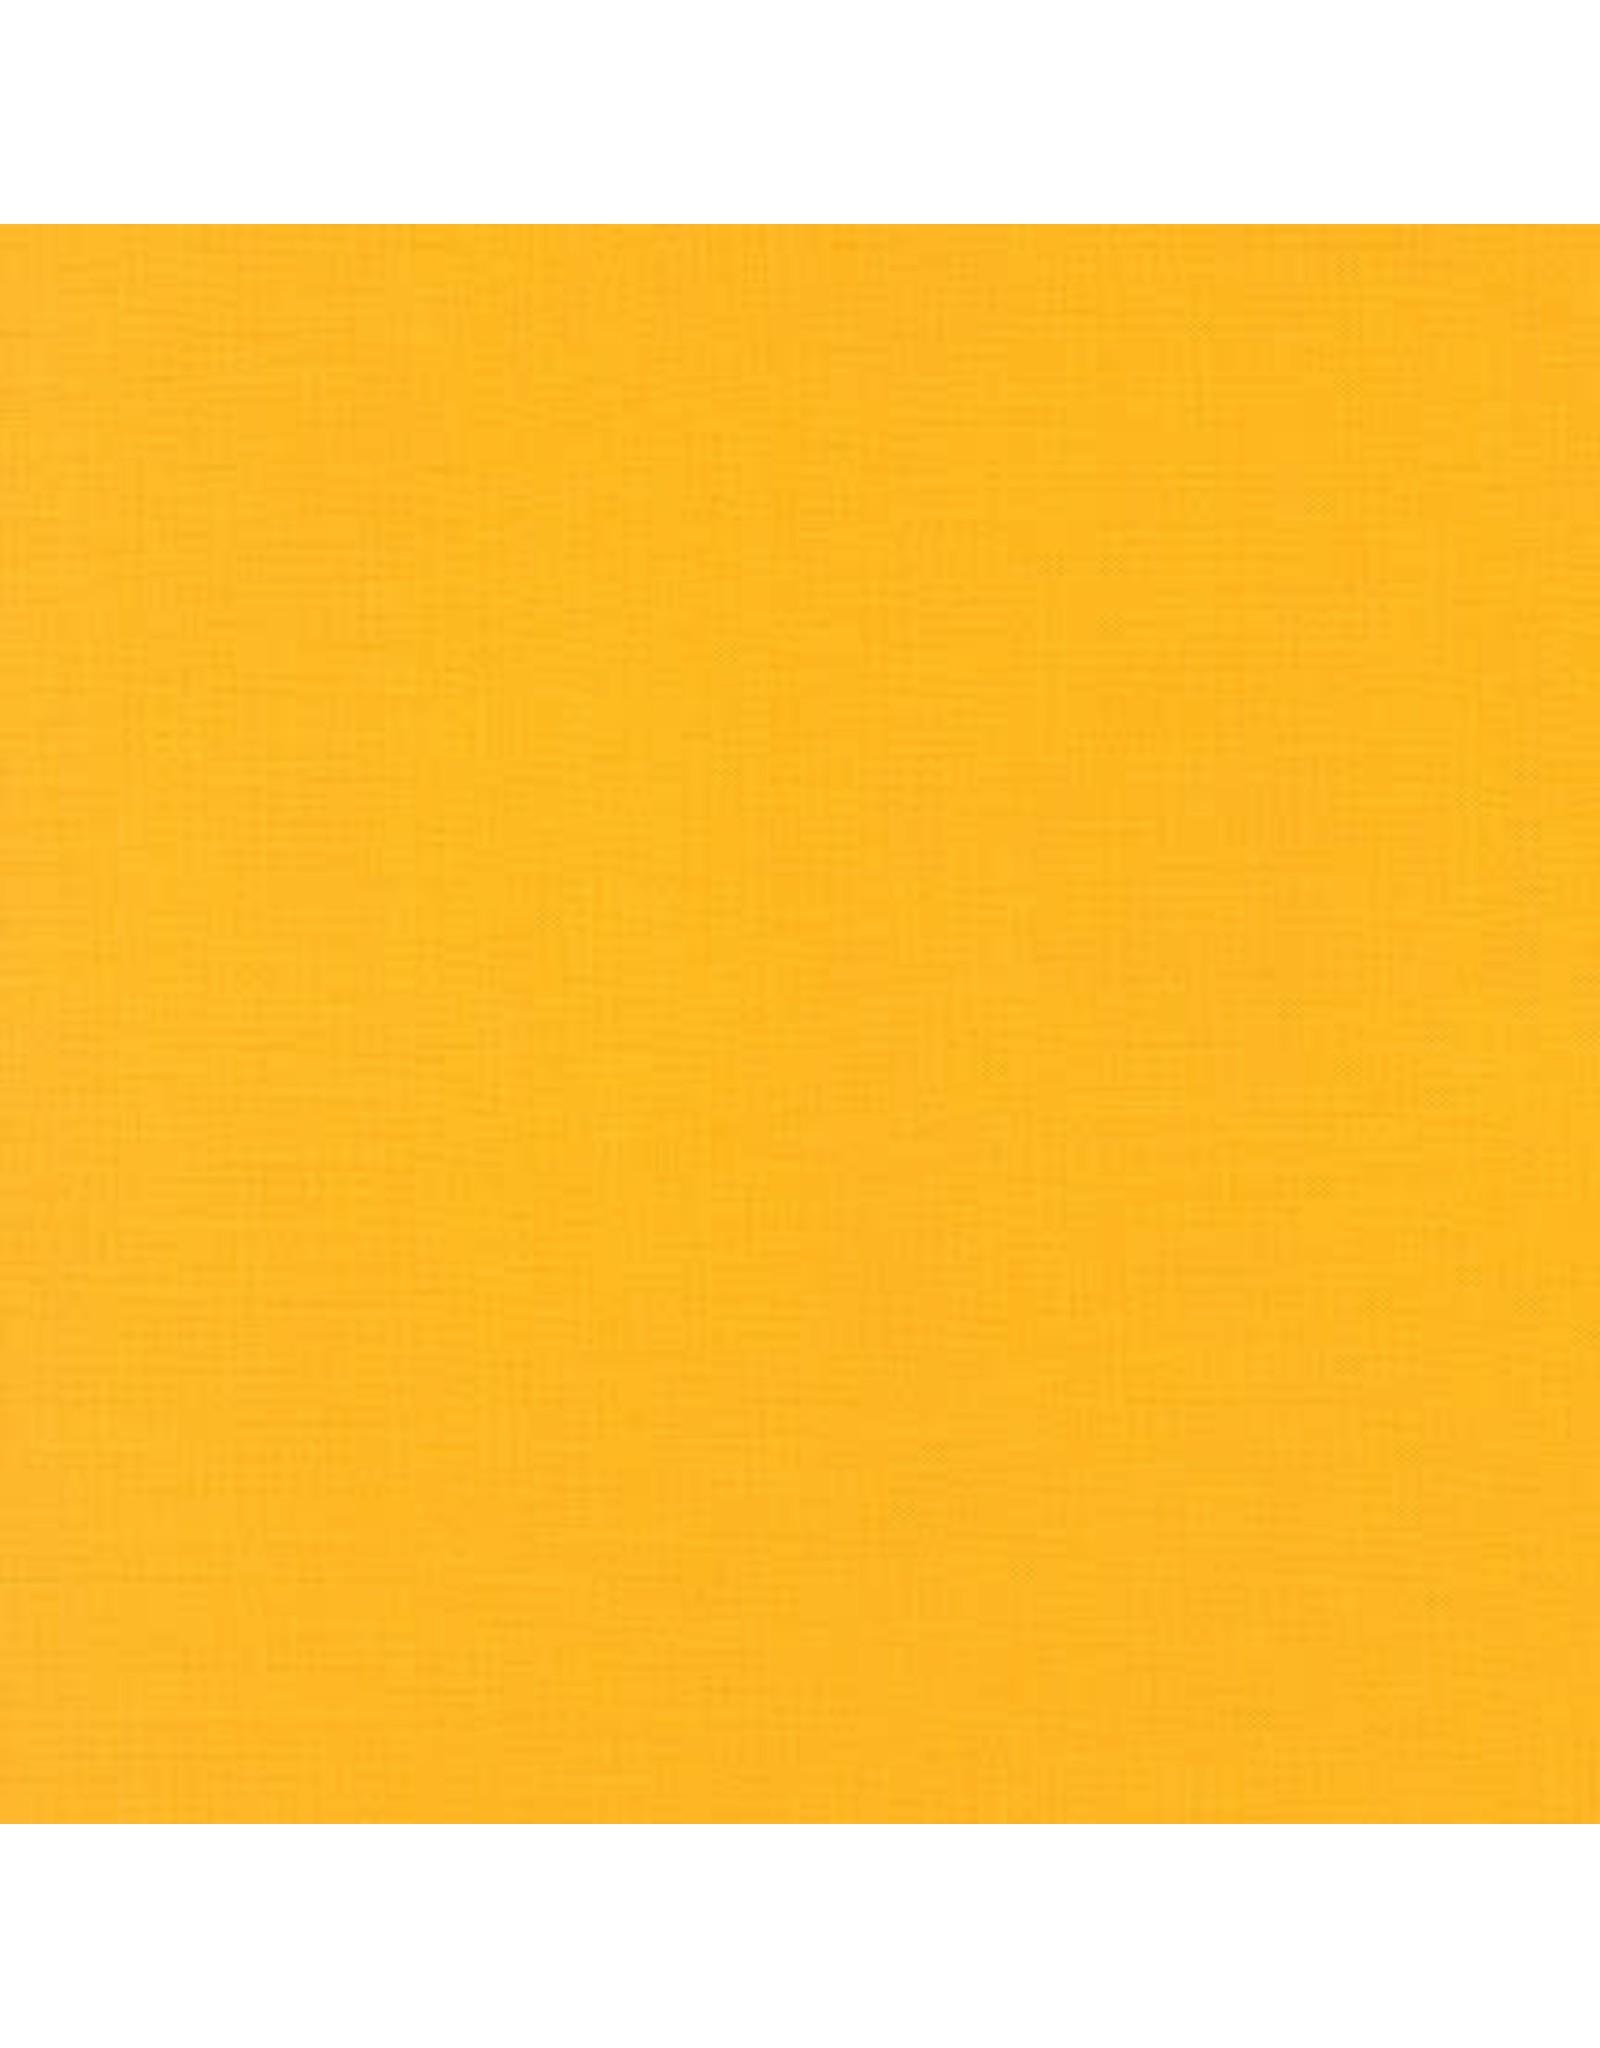 Robert Kaufman Kona Cotton in Corn Yellow, Fabric Half-Yards